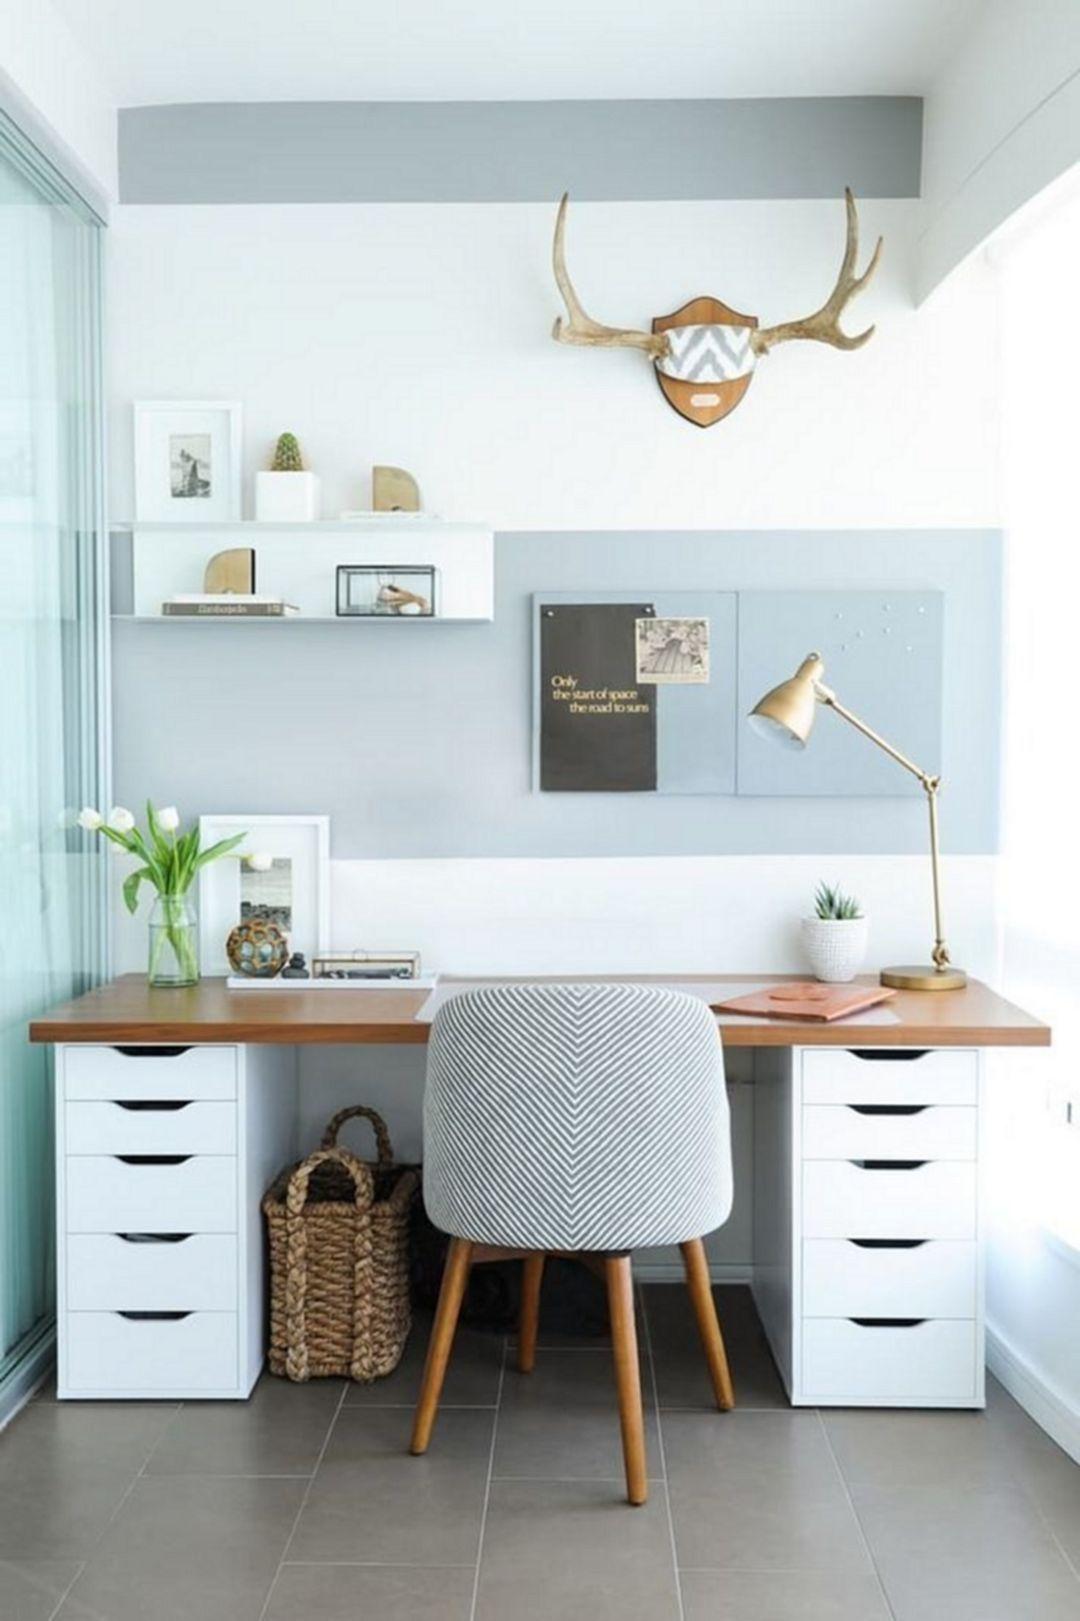 25 Best & Stunning Modern Home Office Design Ideas in This